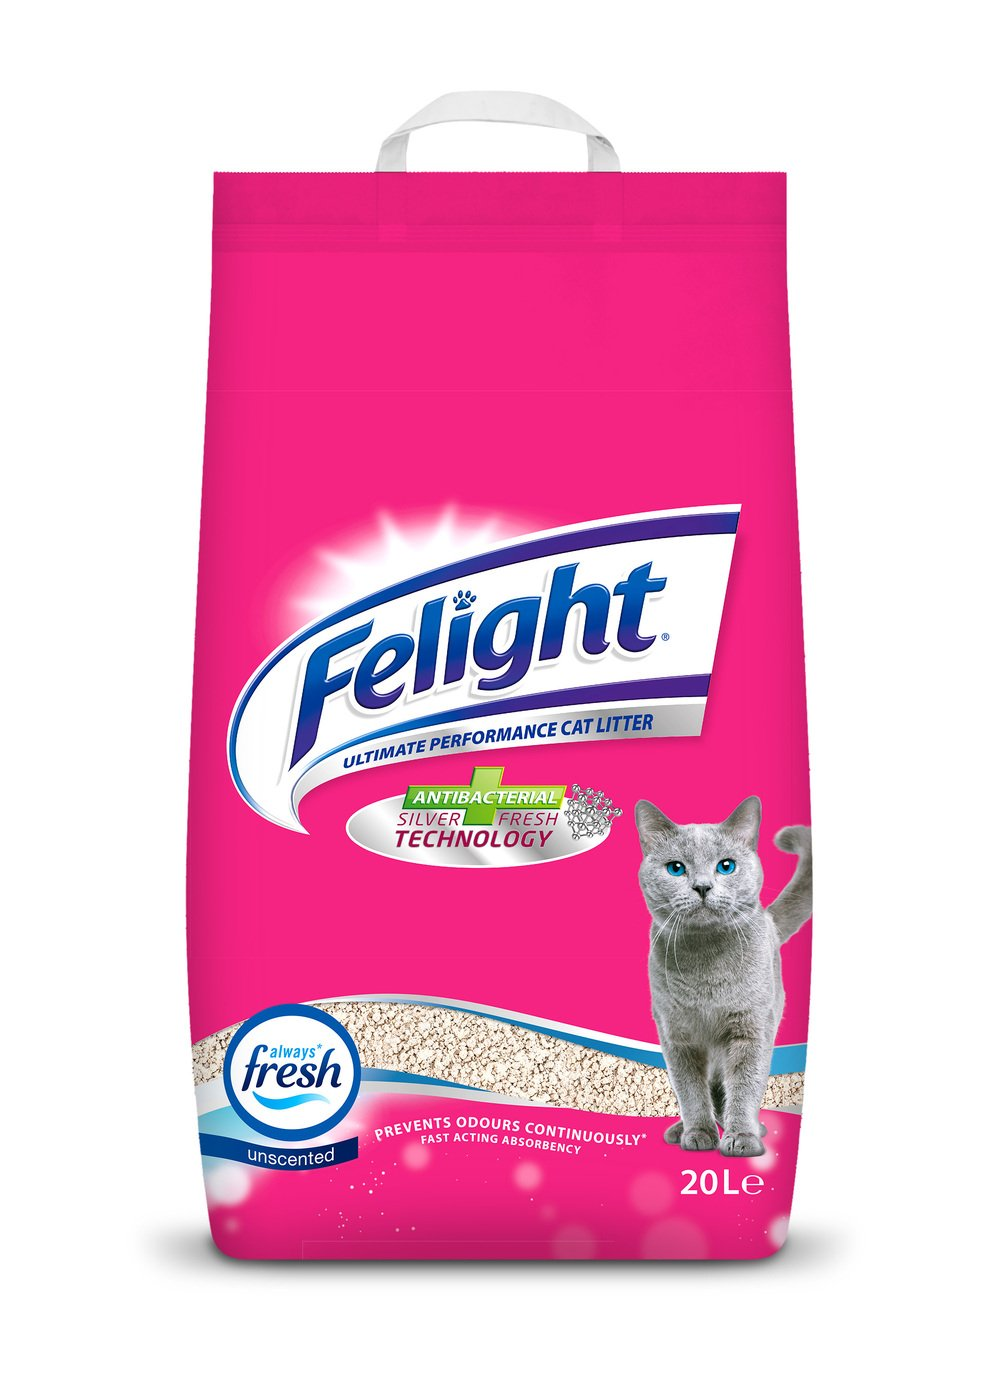 Felight 20L Antibacterial Non-Clumping Cat Litter